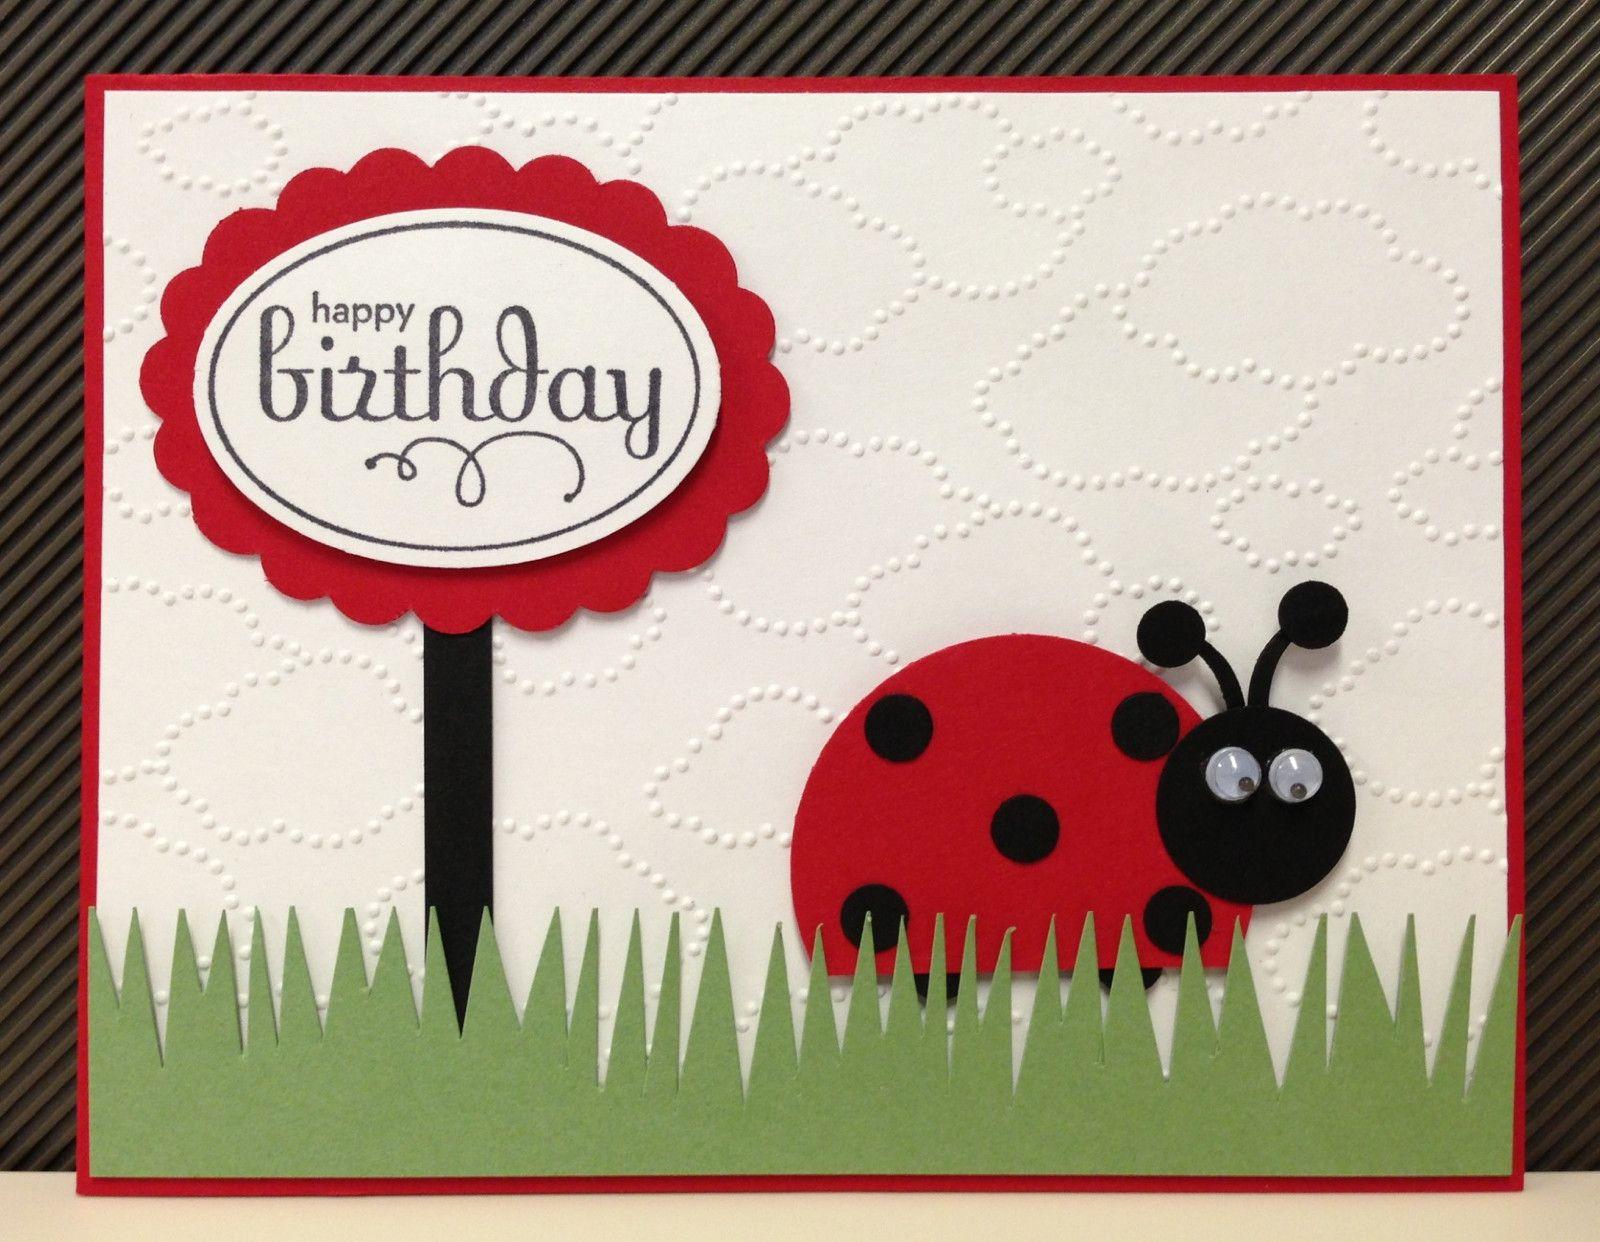 Ladybug punch art stampin up birthday card kit 5 cards punch ladybug punch art stampin up birthday card kit 5 cards ebay bookmarktalkfo Images